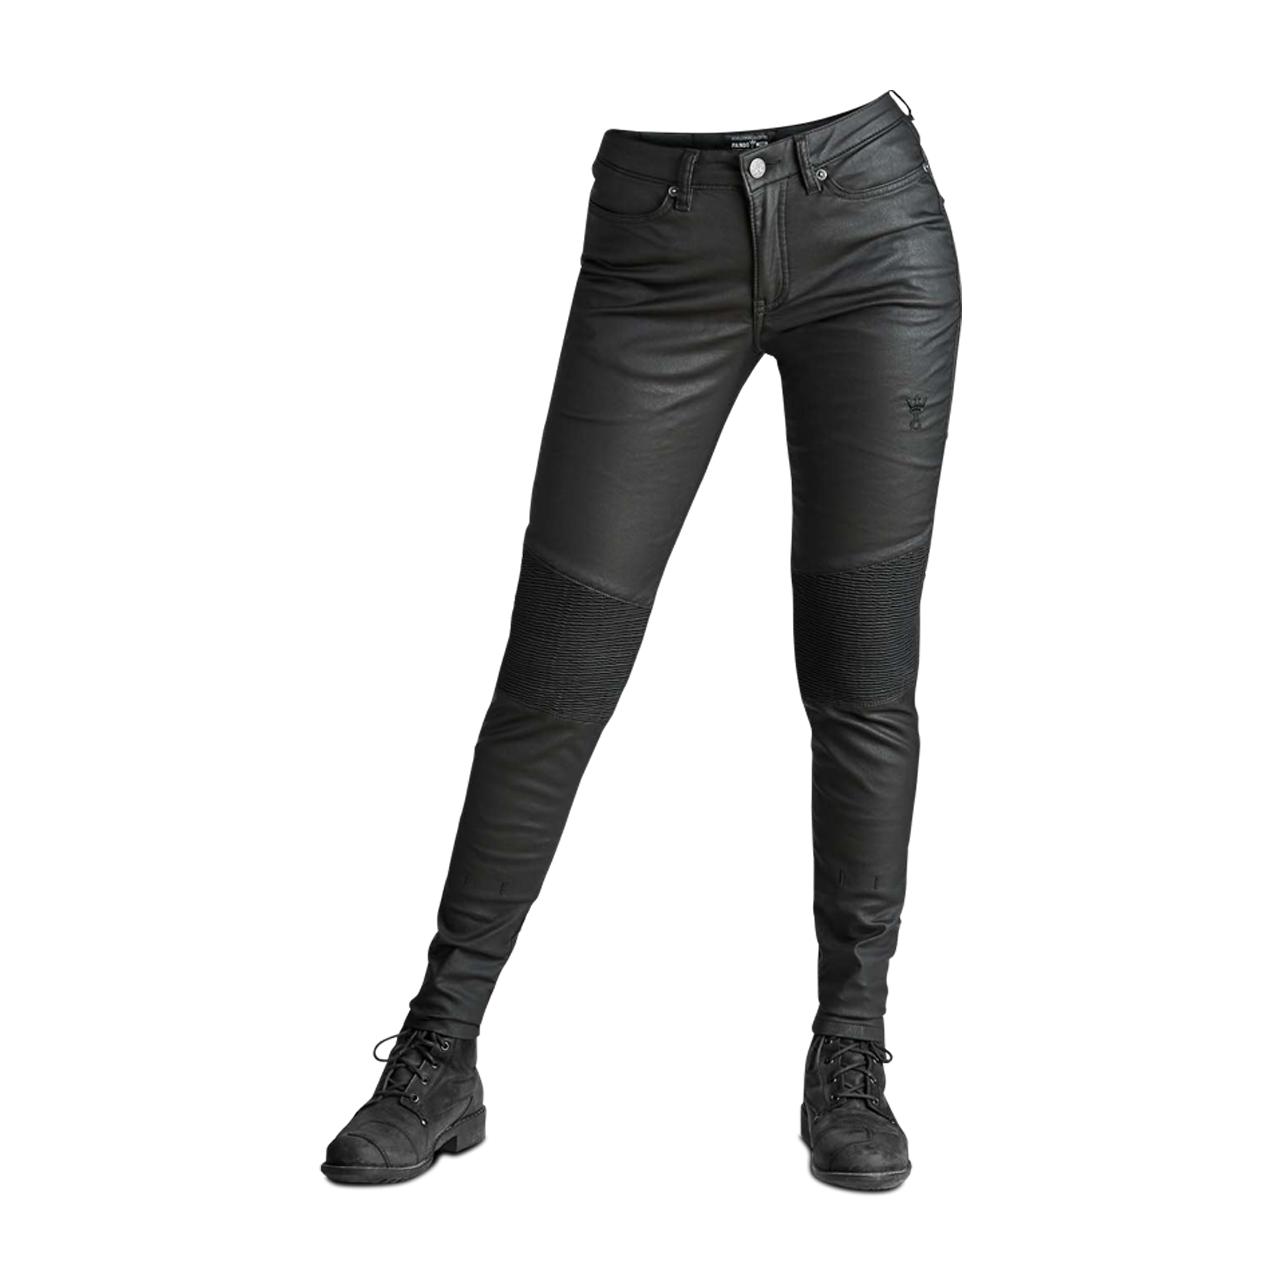 Pando Moto Jeans Moto Donna  Kusari Kev 02 Neri